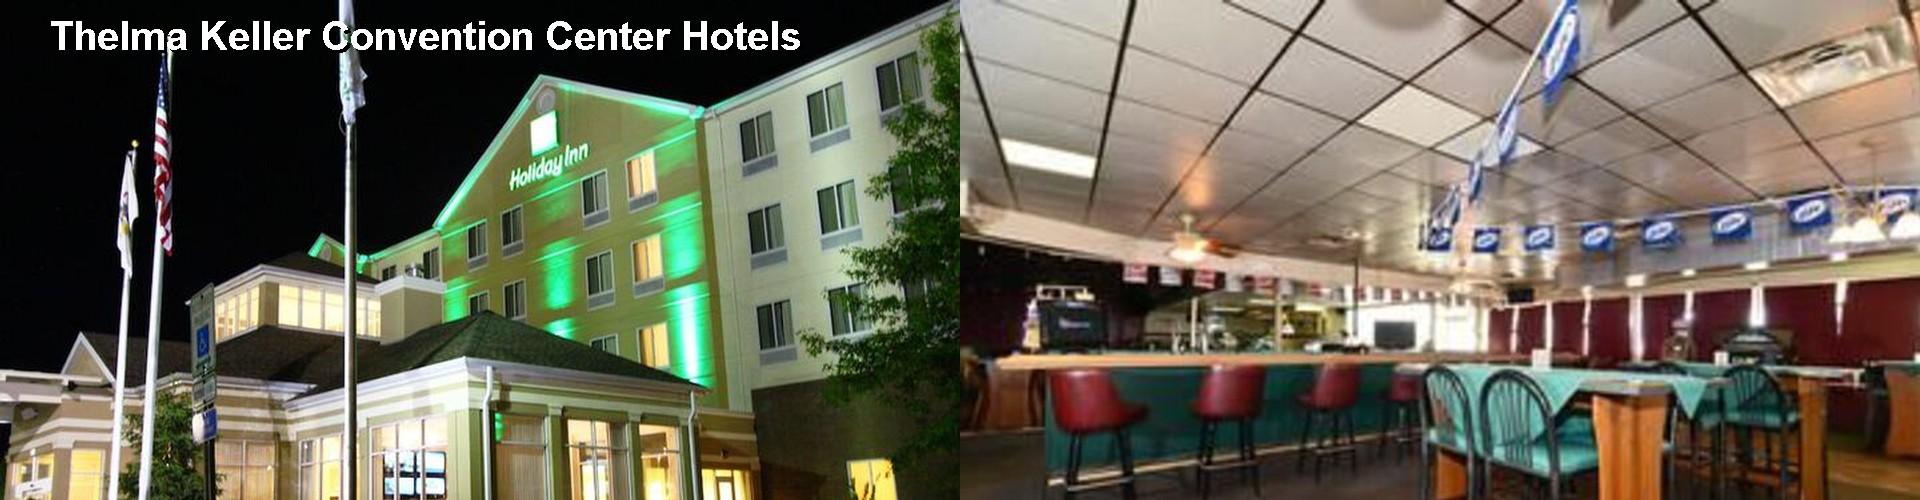 5 Best Hotels Near Thelma Keller Convention Center